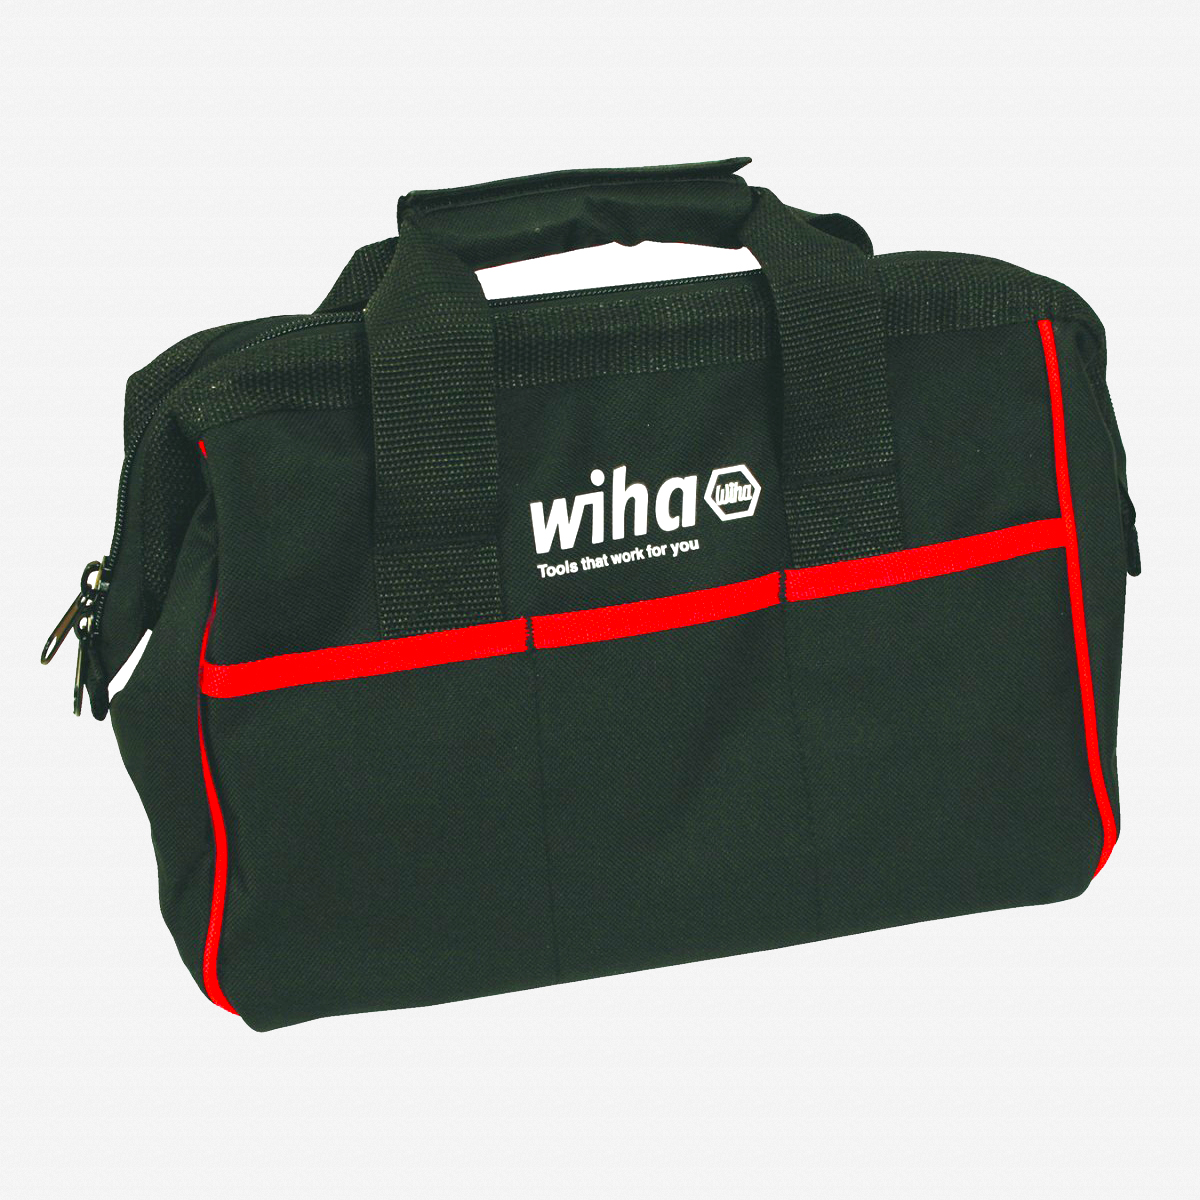 "Wiha 91291 12.5"" Heavy Duty Canvas Tool Bag - KC Tool"